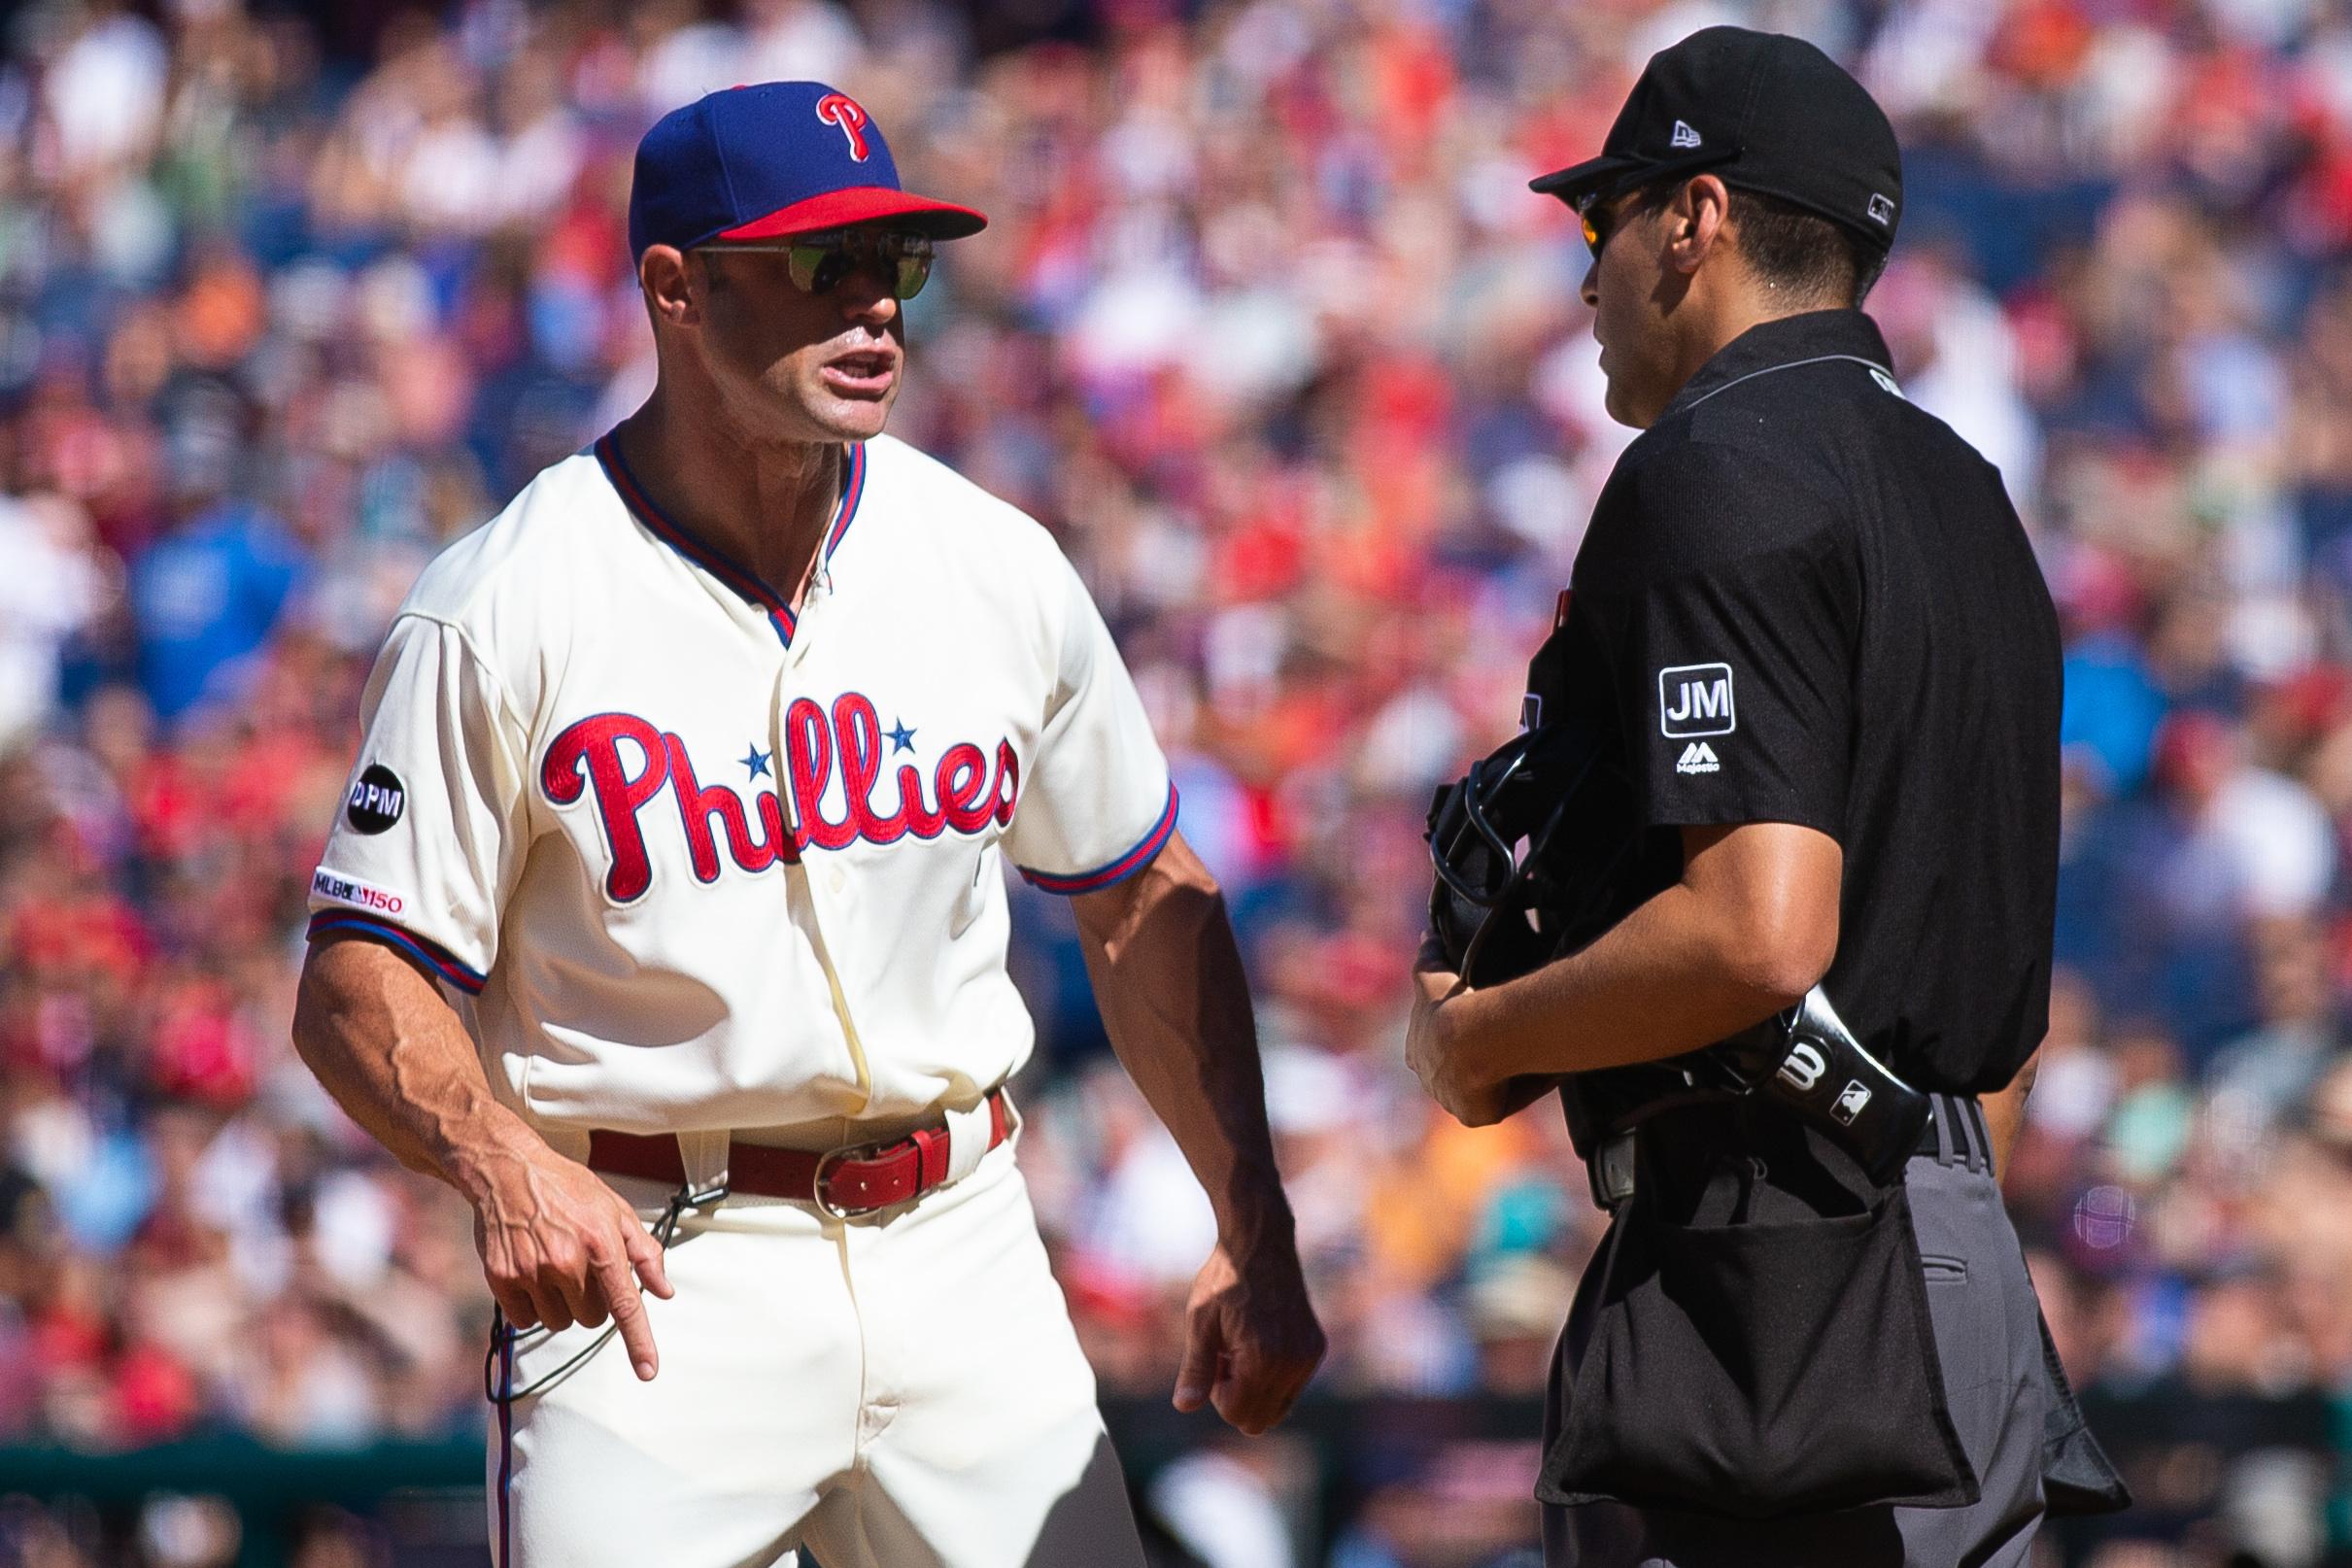 MLB: Boston Red Sox at Philadelphia Phillies